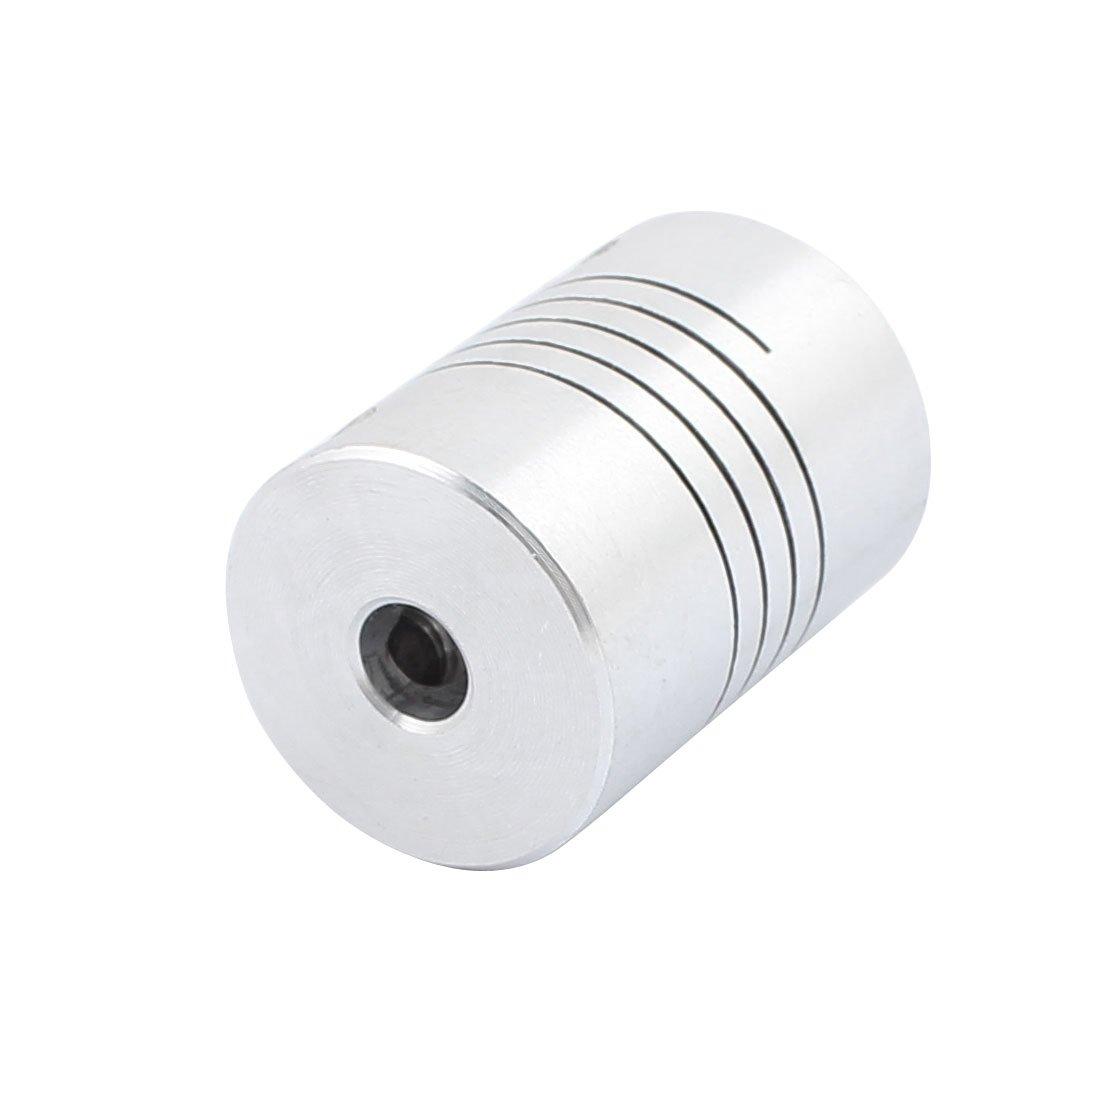 sourcingmap 4mm to 4mm Shaft Coupling 25mm Length 18mm Diameter Stepper Motor Coupler Aluminum Alloy Joint Connector for 3D Printer CNC Machine DIY Encoder